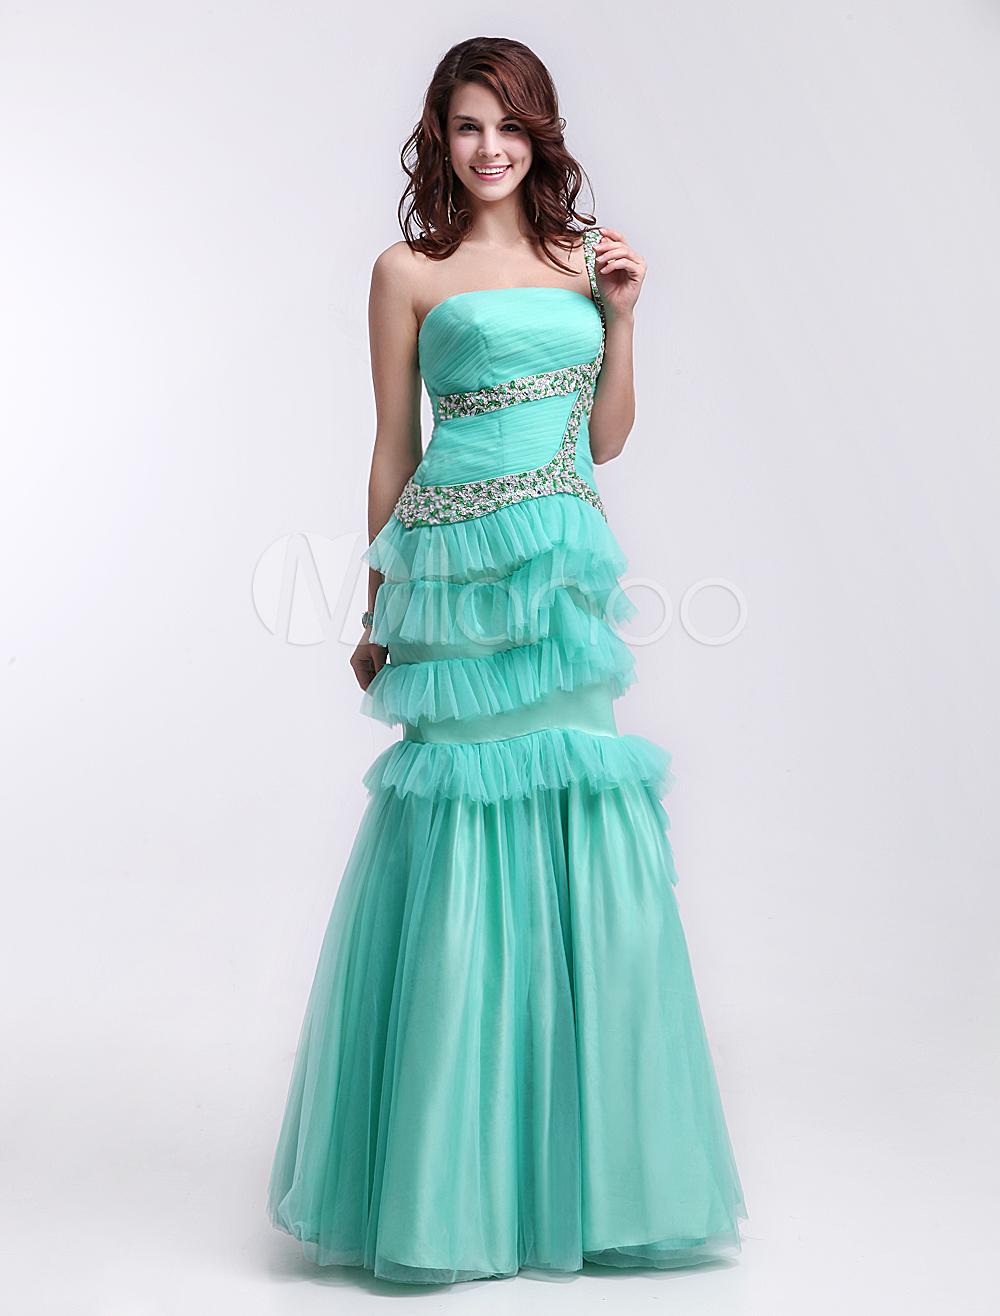 Fashion Mint Green Strapless Floor Length Tiered Mermaid Prom Dress Milanoo (Wedding Prom Dresses) photo